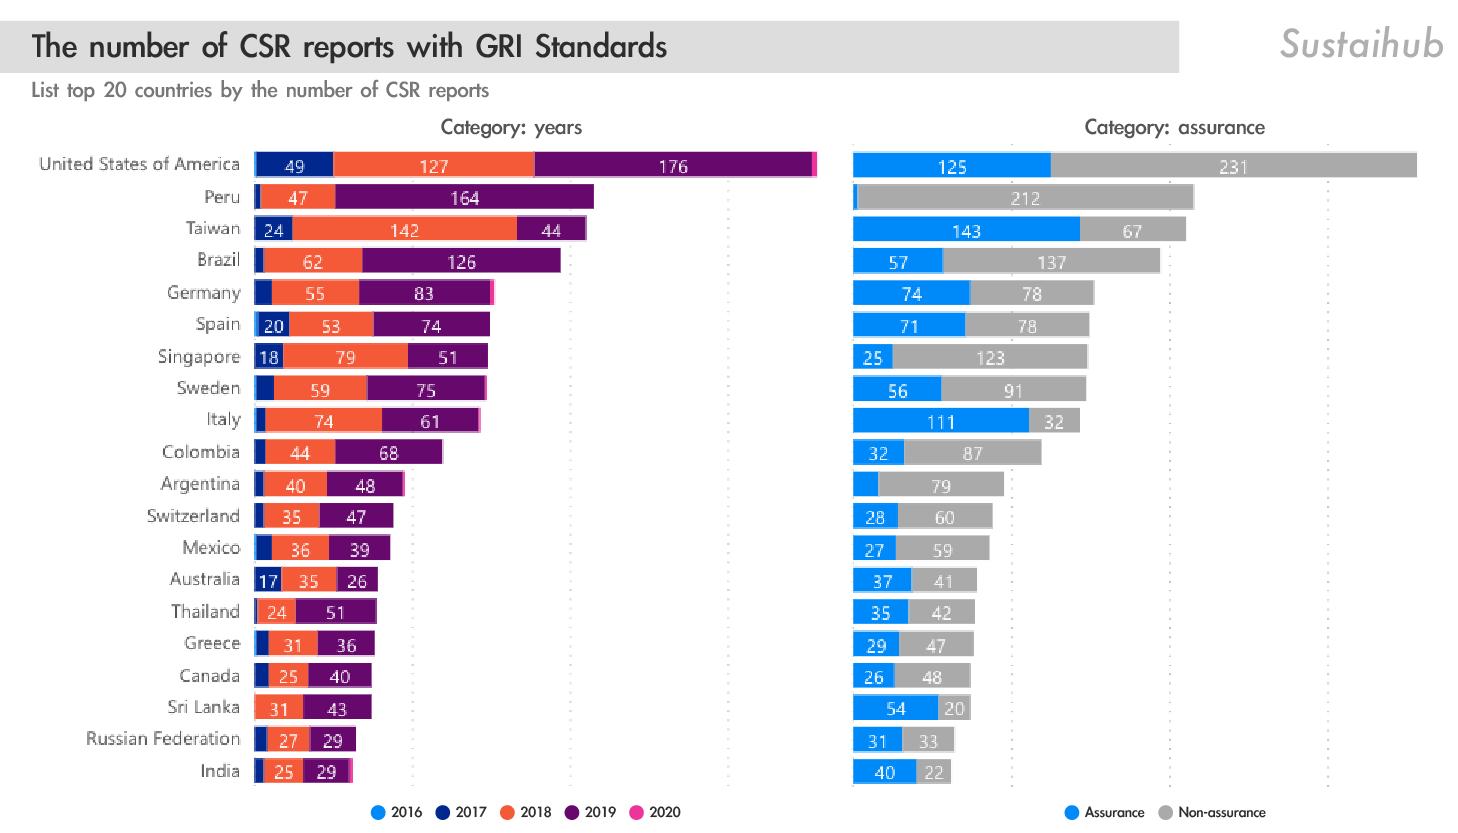 各國採用GRI Standards的報告總數 The number of CSR report with GRI Standards in each nation